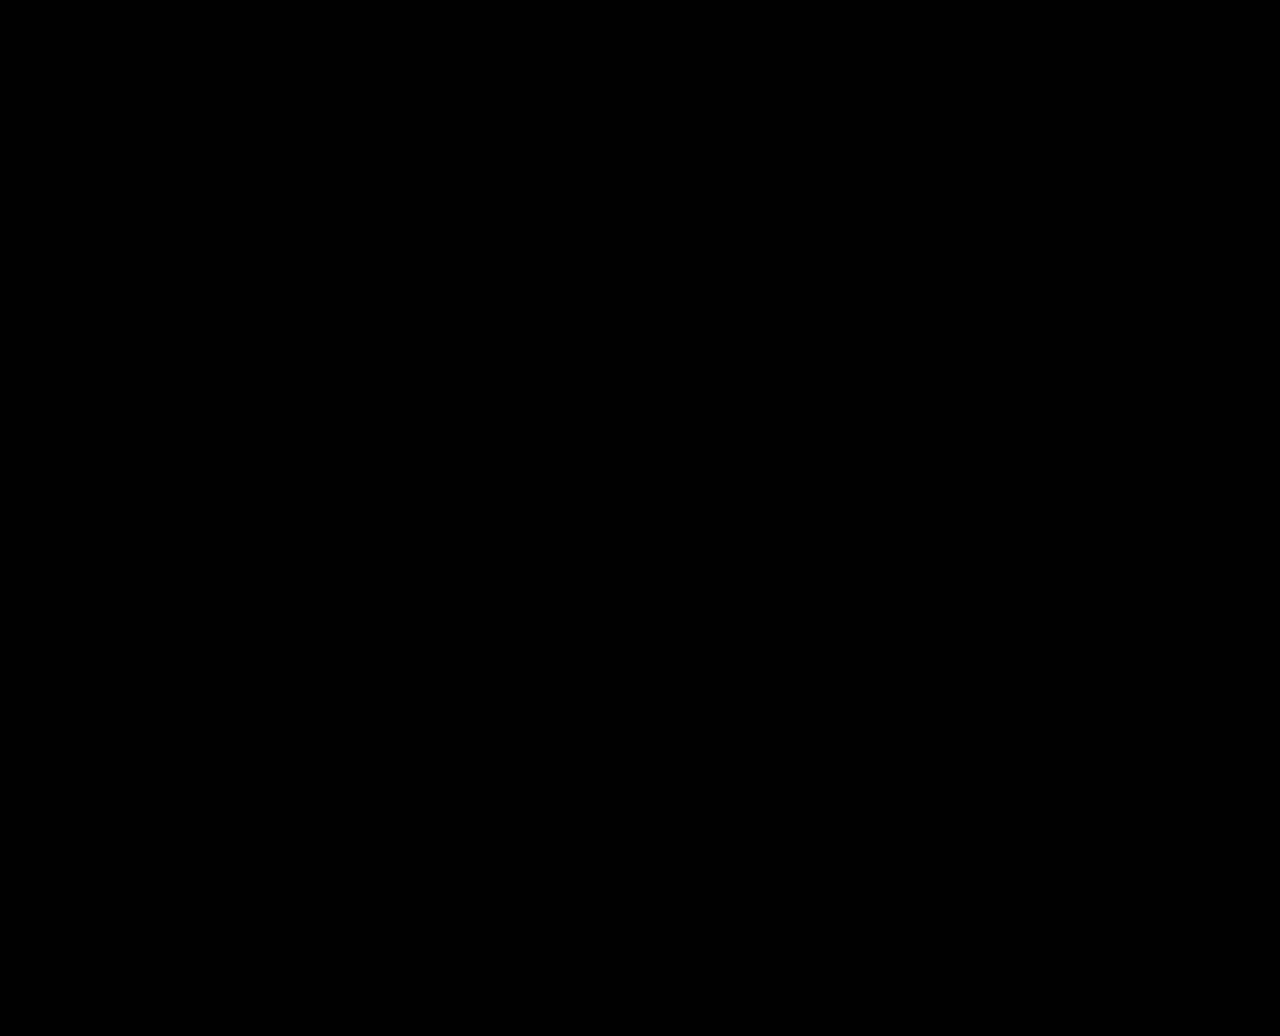 Tee Shirt Black Free Vector Graphic On Pixabay